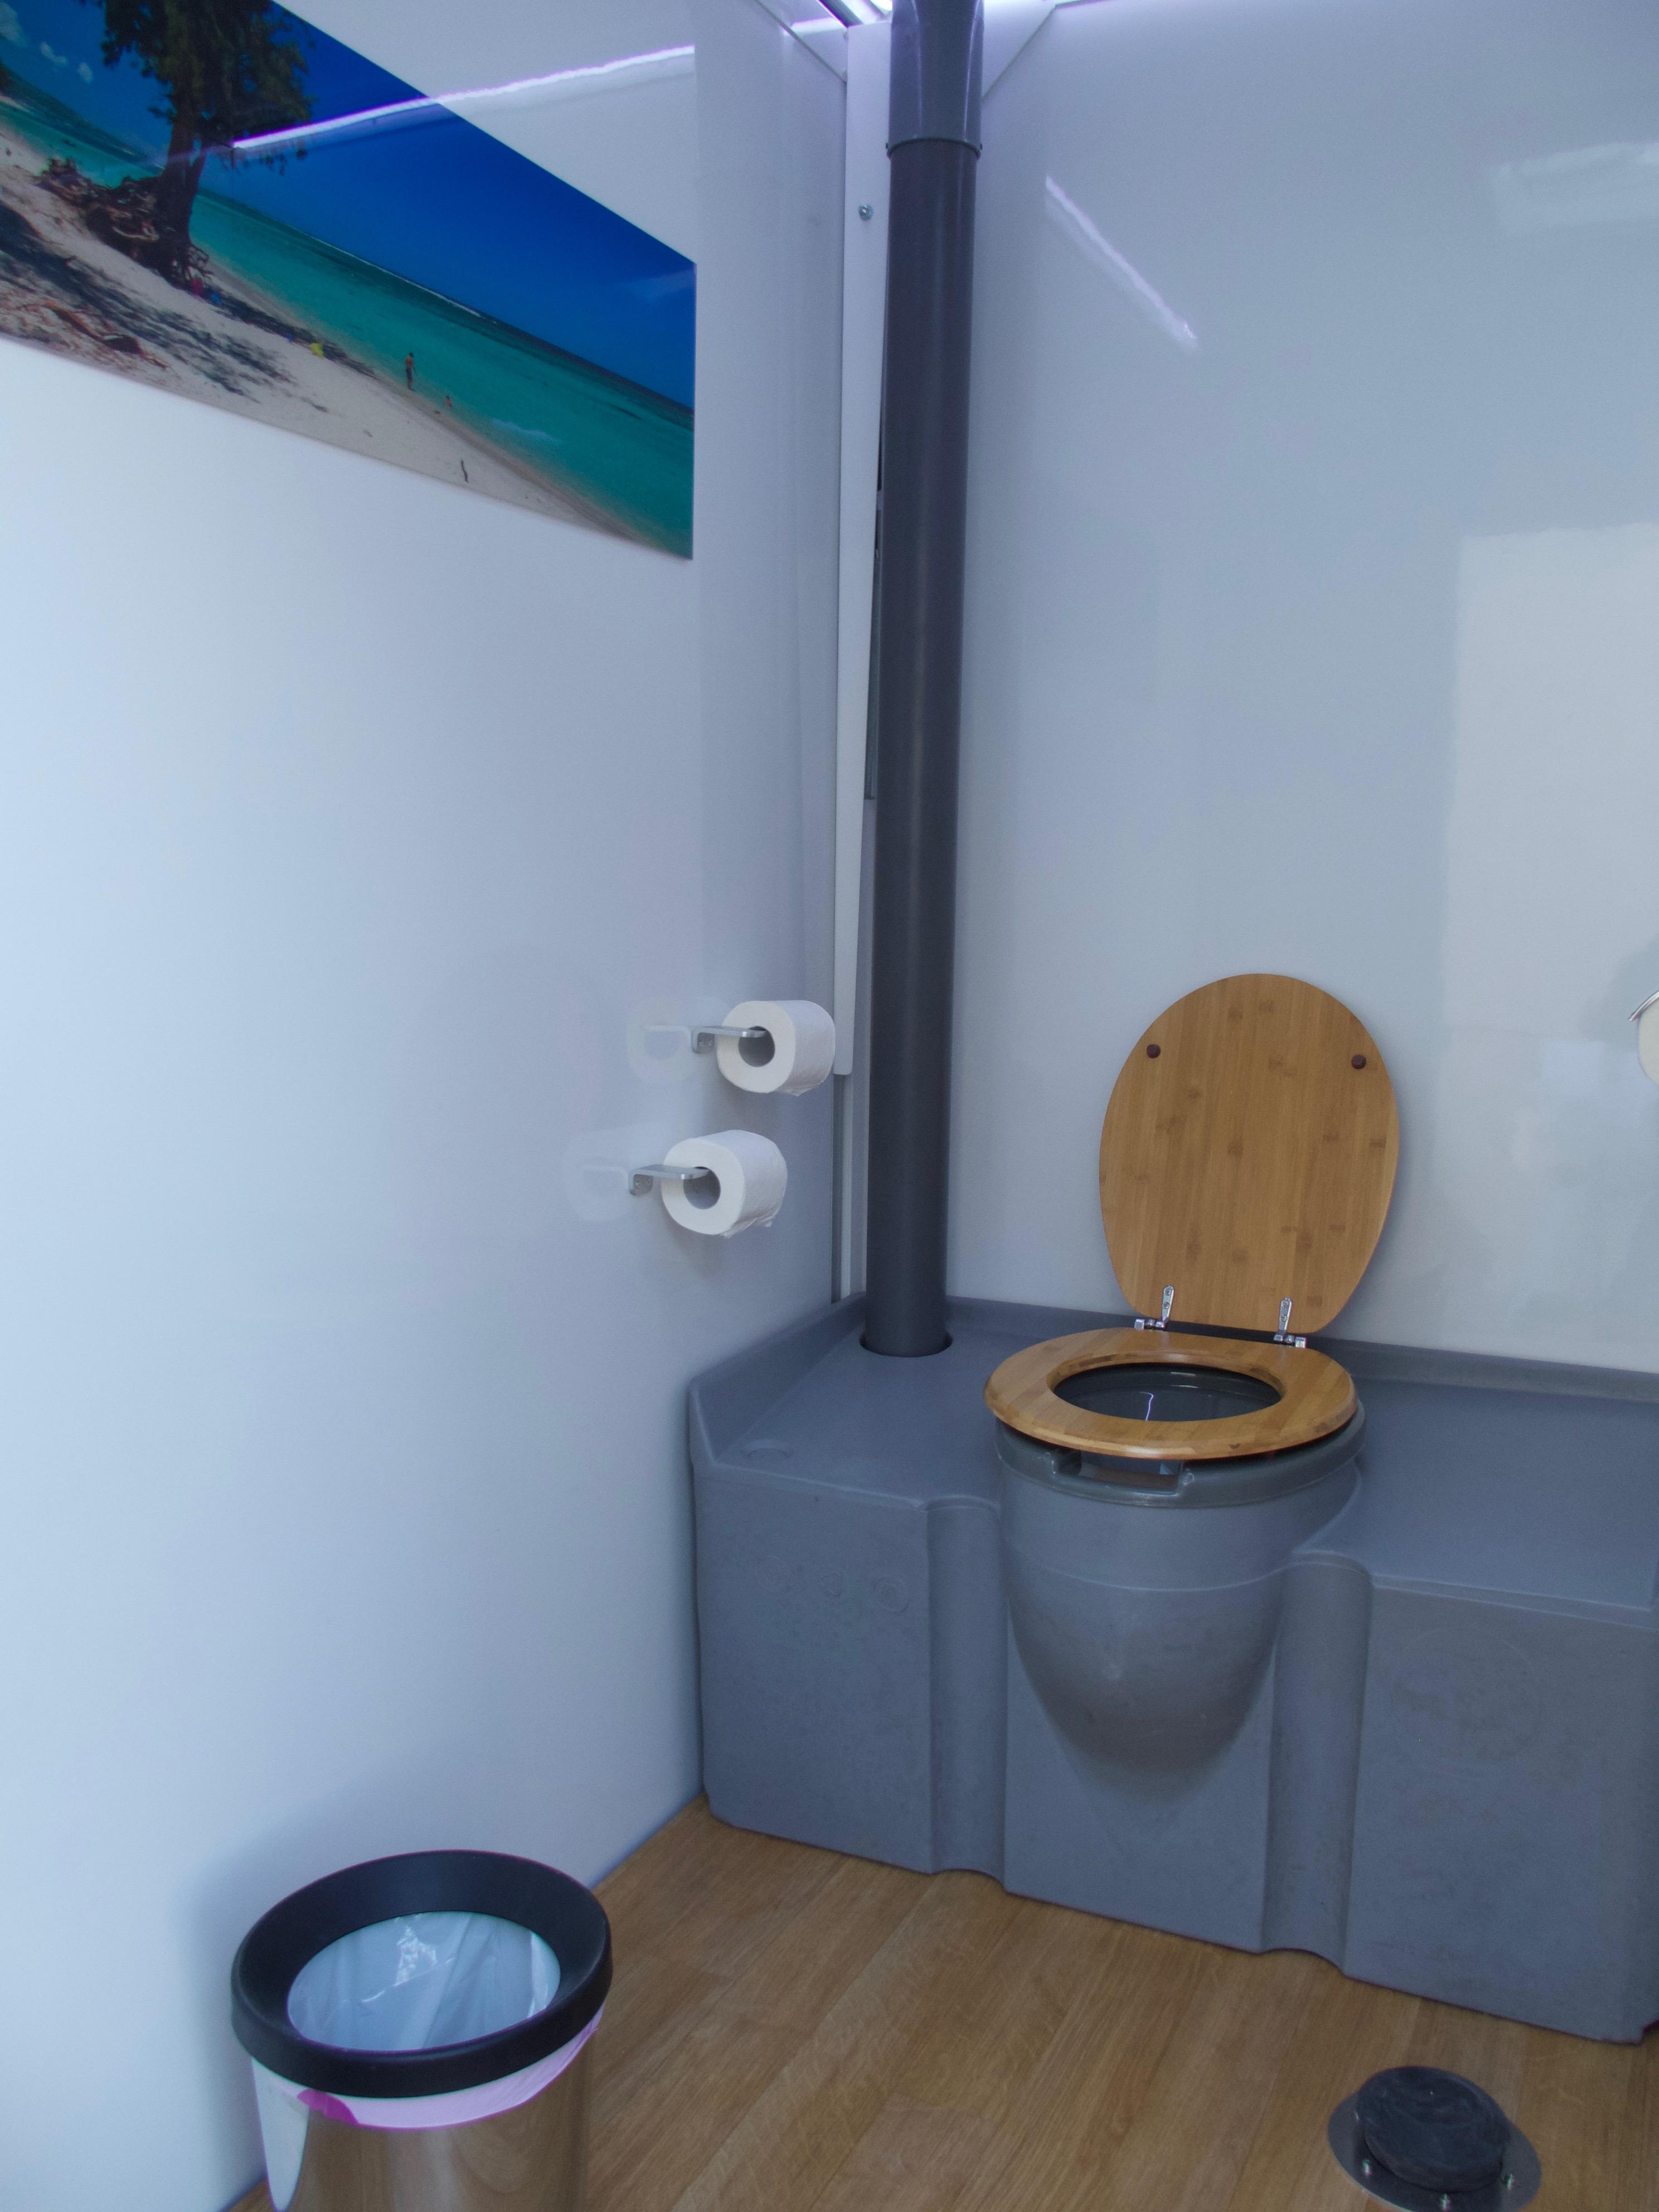 Caravane Sanitaire Confort Bio Sanitaire Location